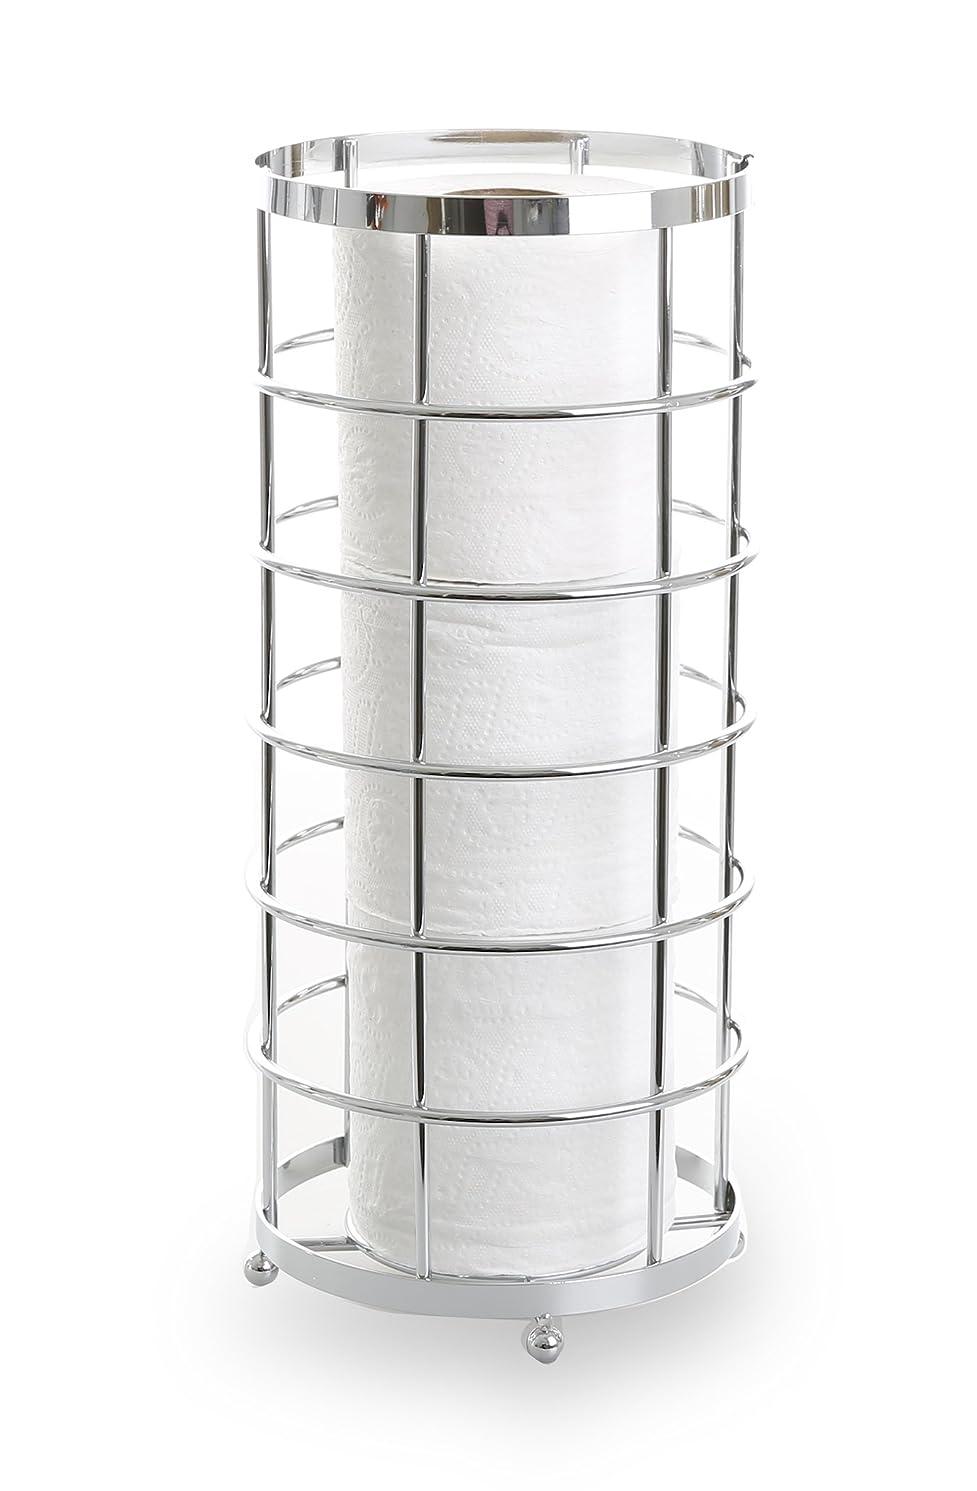 BINO 'The Astra' Toilet Paper Reserve, Chrome